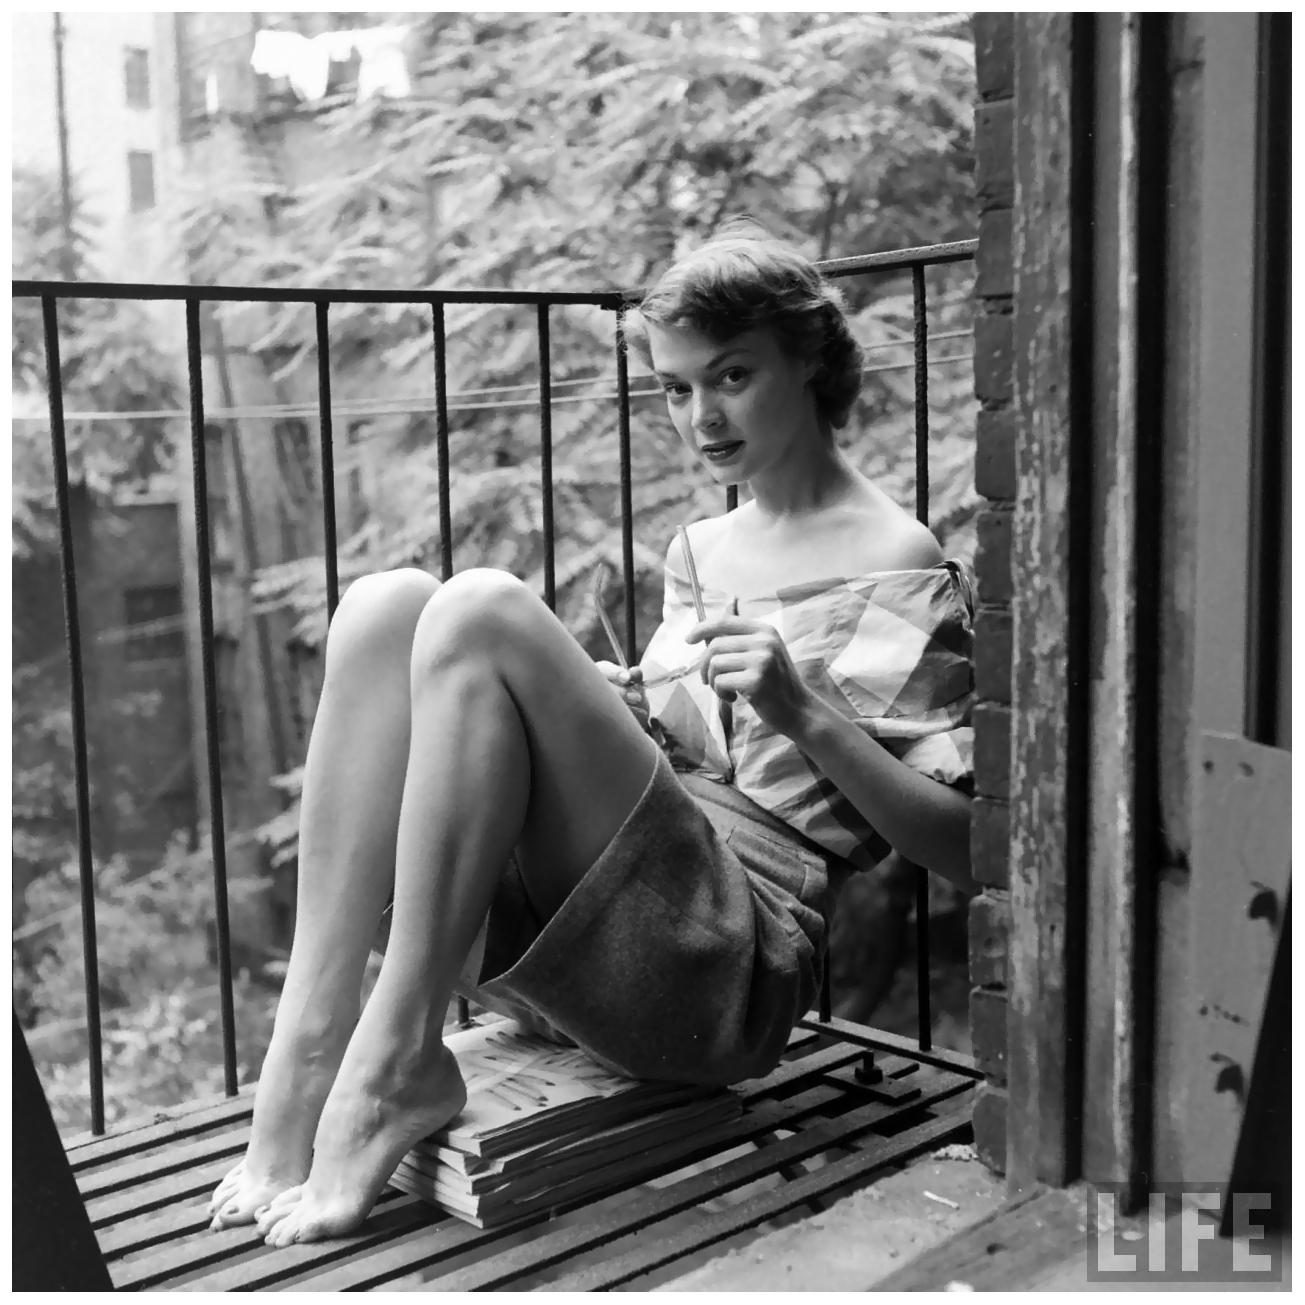 Fire Escape New York City 1940s : S femmes per second